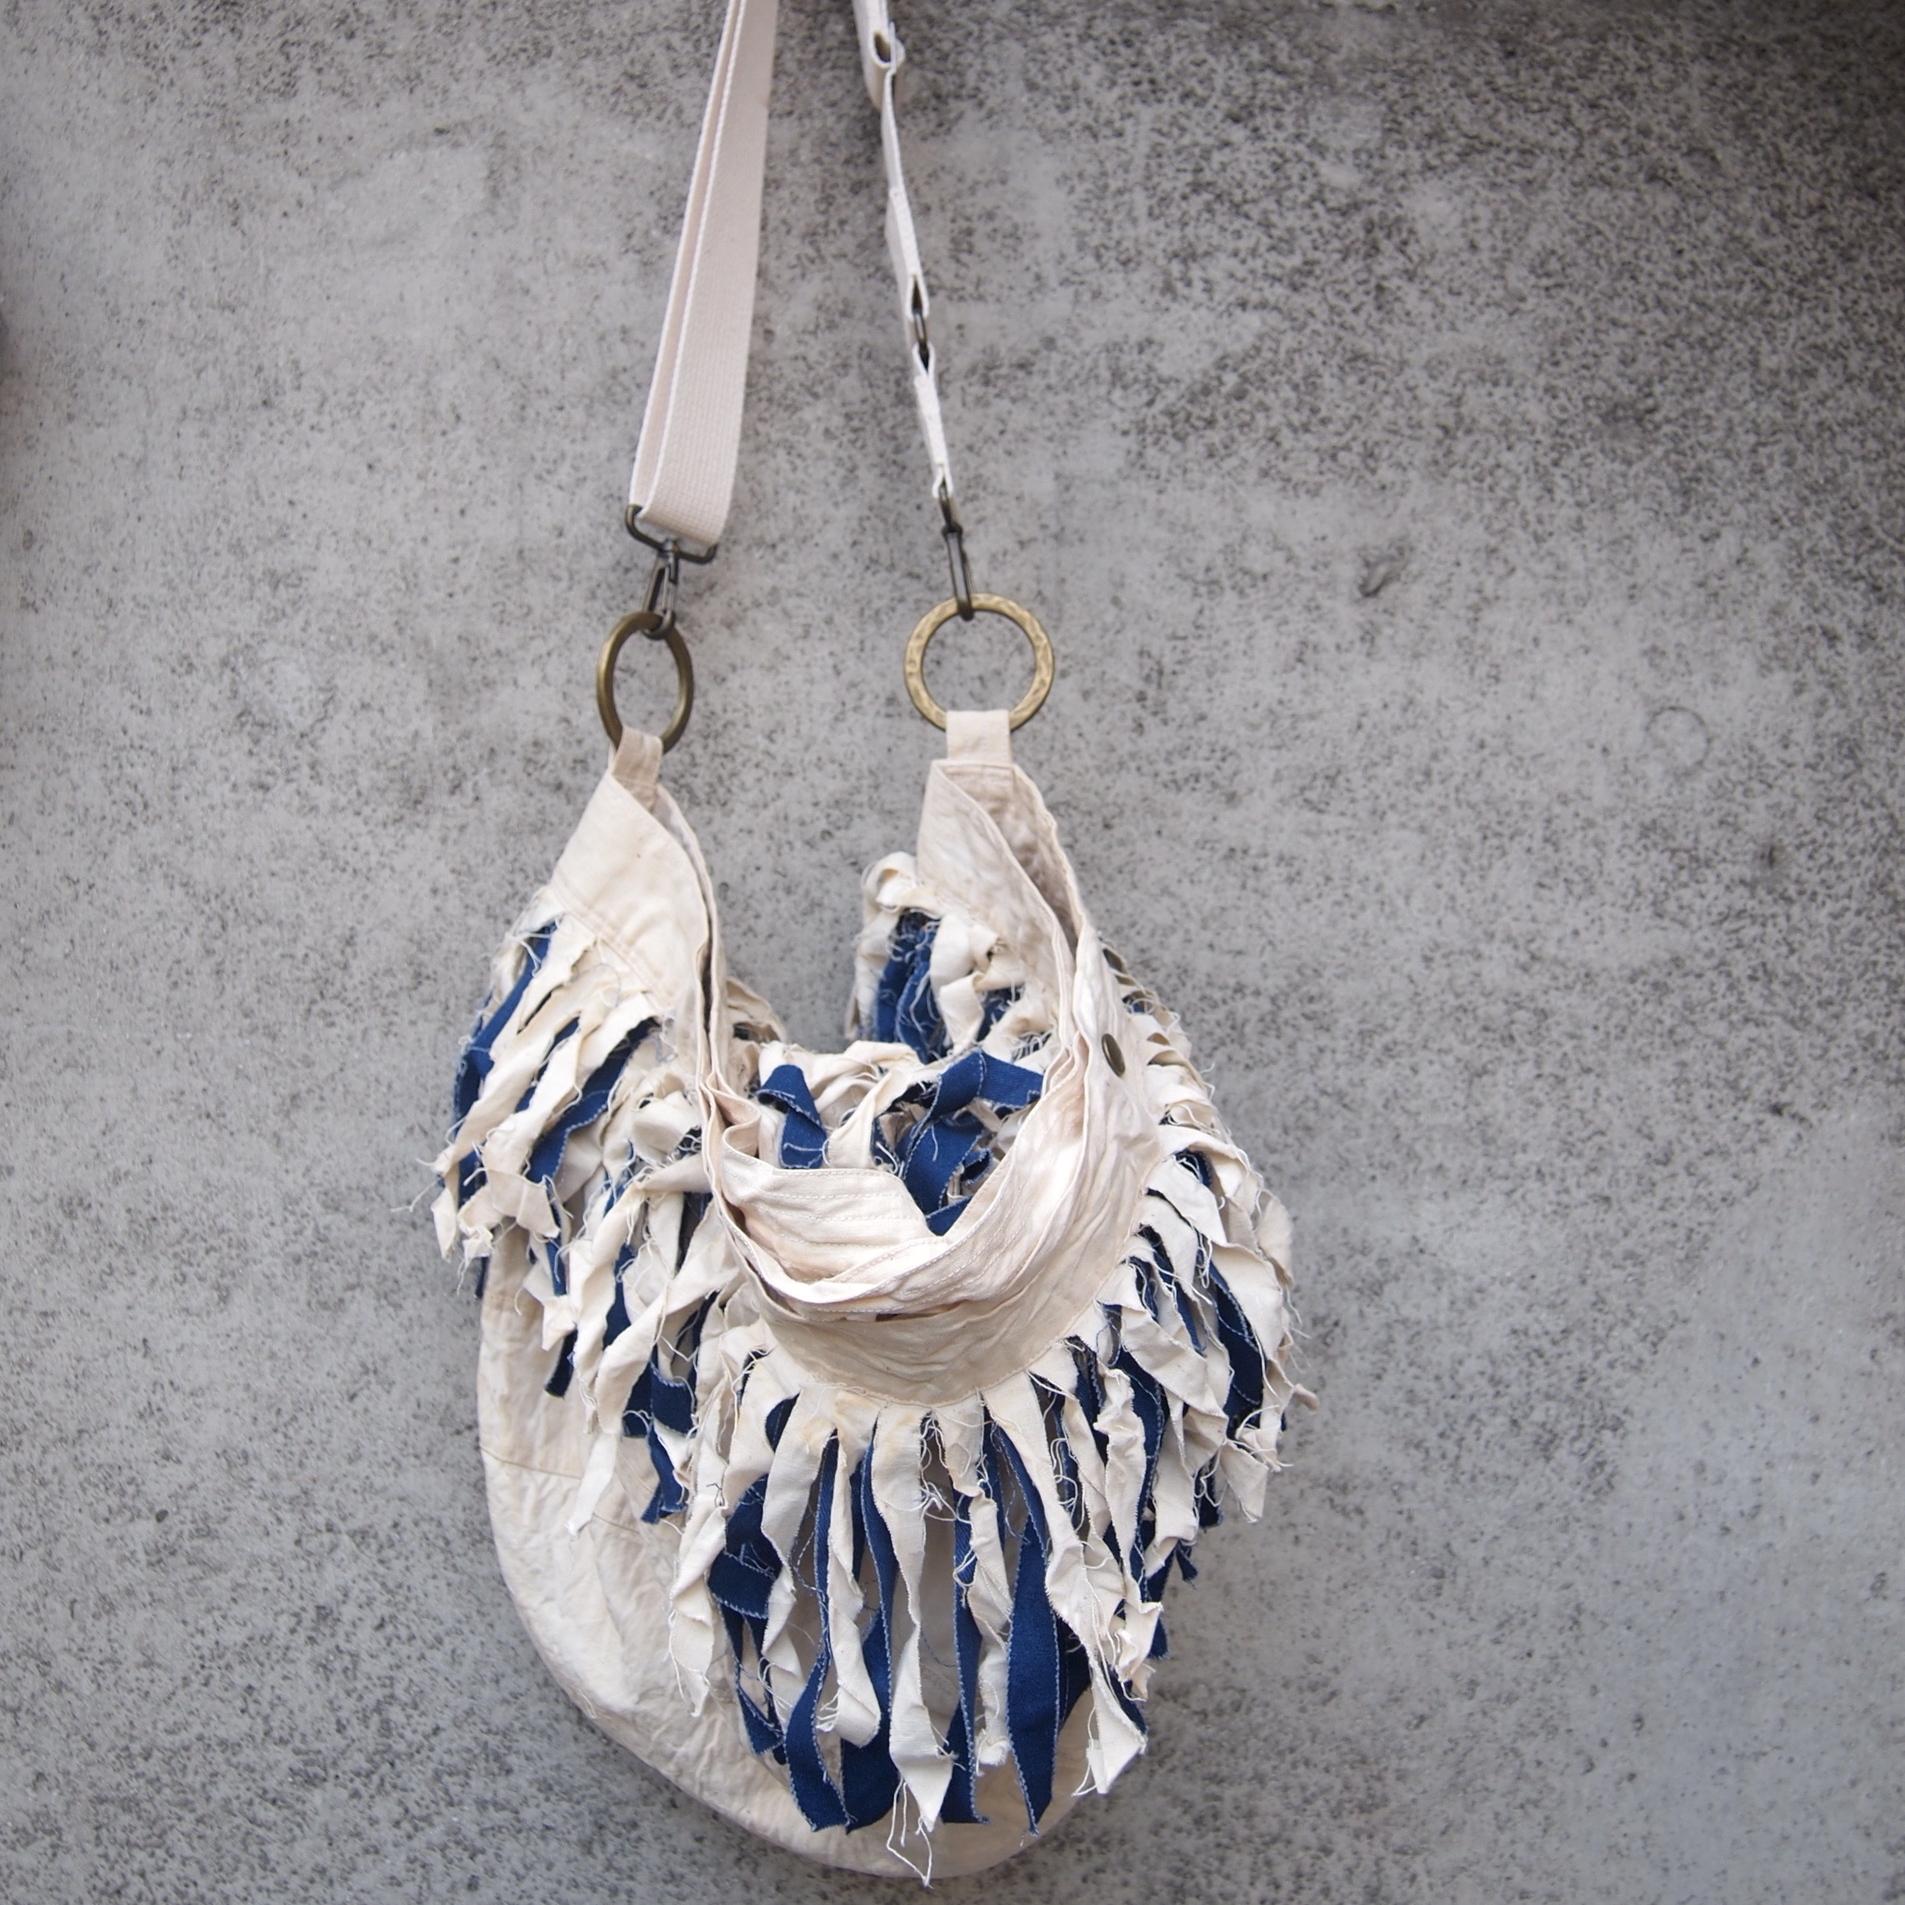 【sandglass】fringe duffle bag/ 【サンドグラス】フリンジ ダッフル バッグ